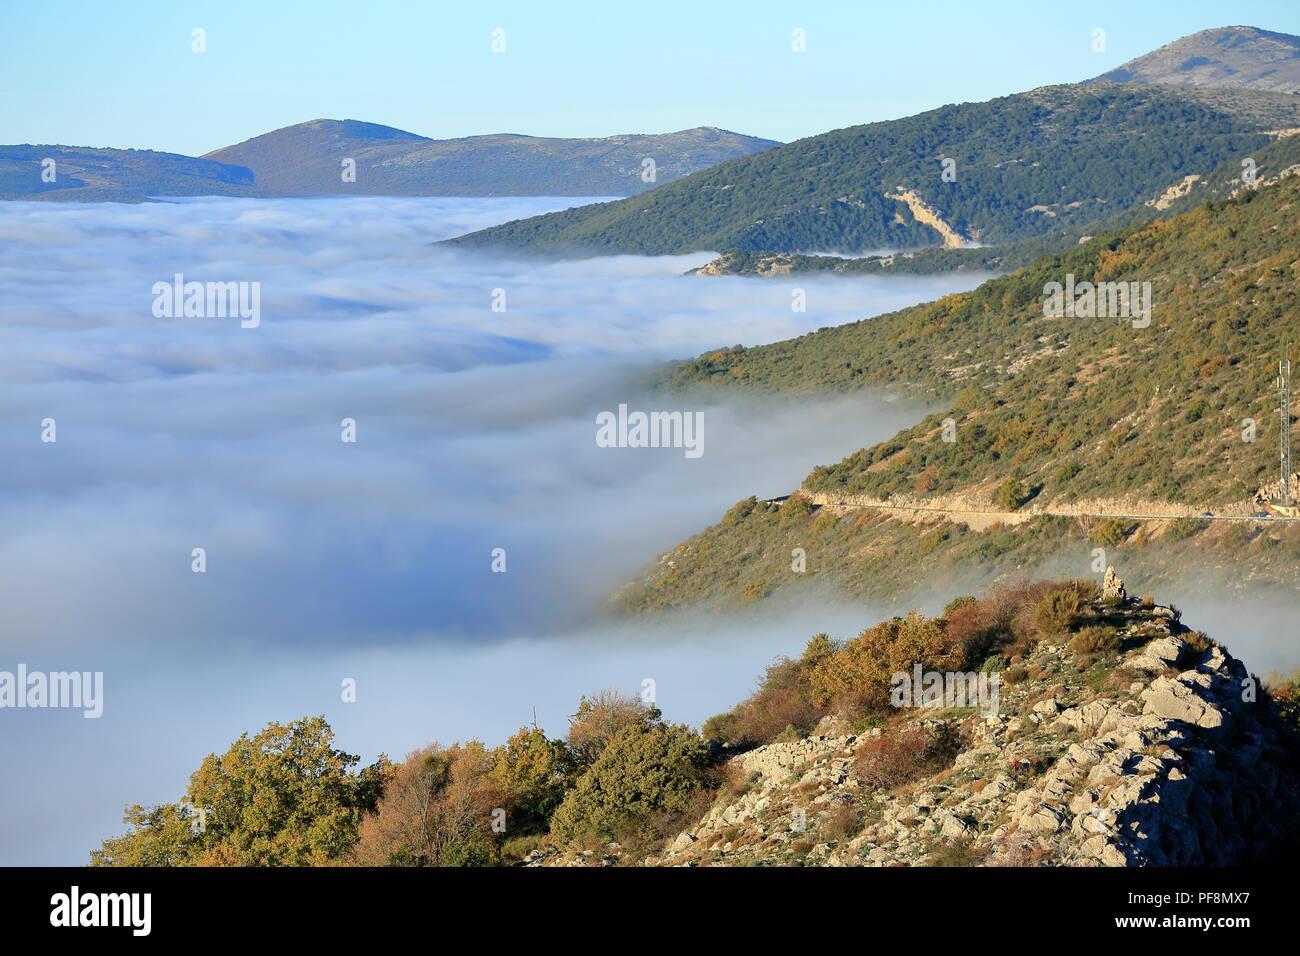 Morning mist, Arriere pays Grassois, Prealpes d'azur, Alpes Maritimes, 06, PACA, France - Stock Image